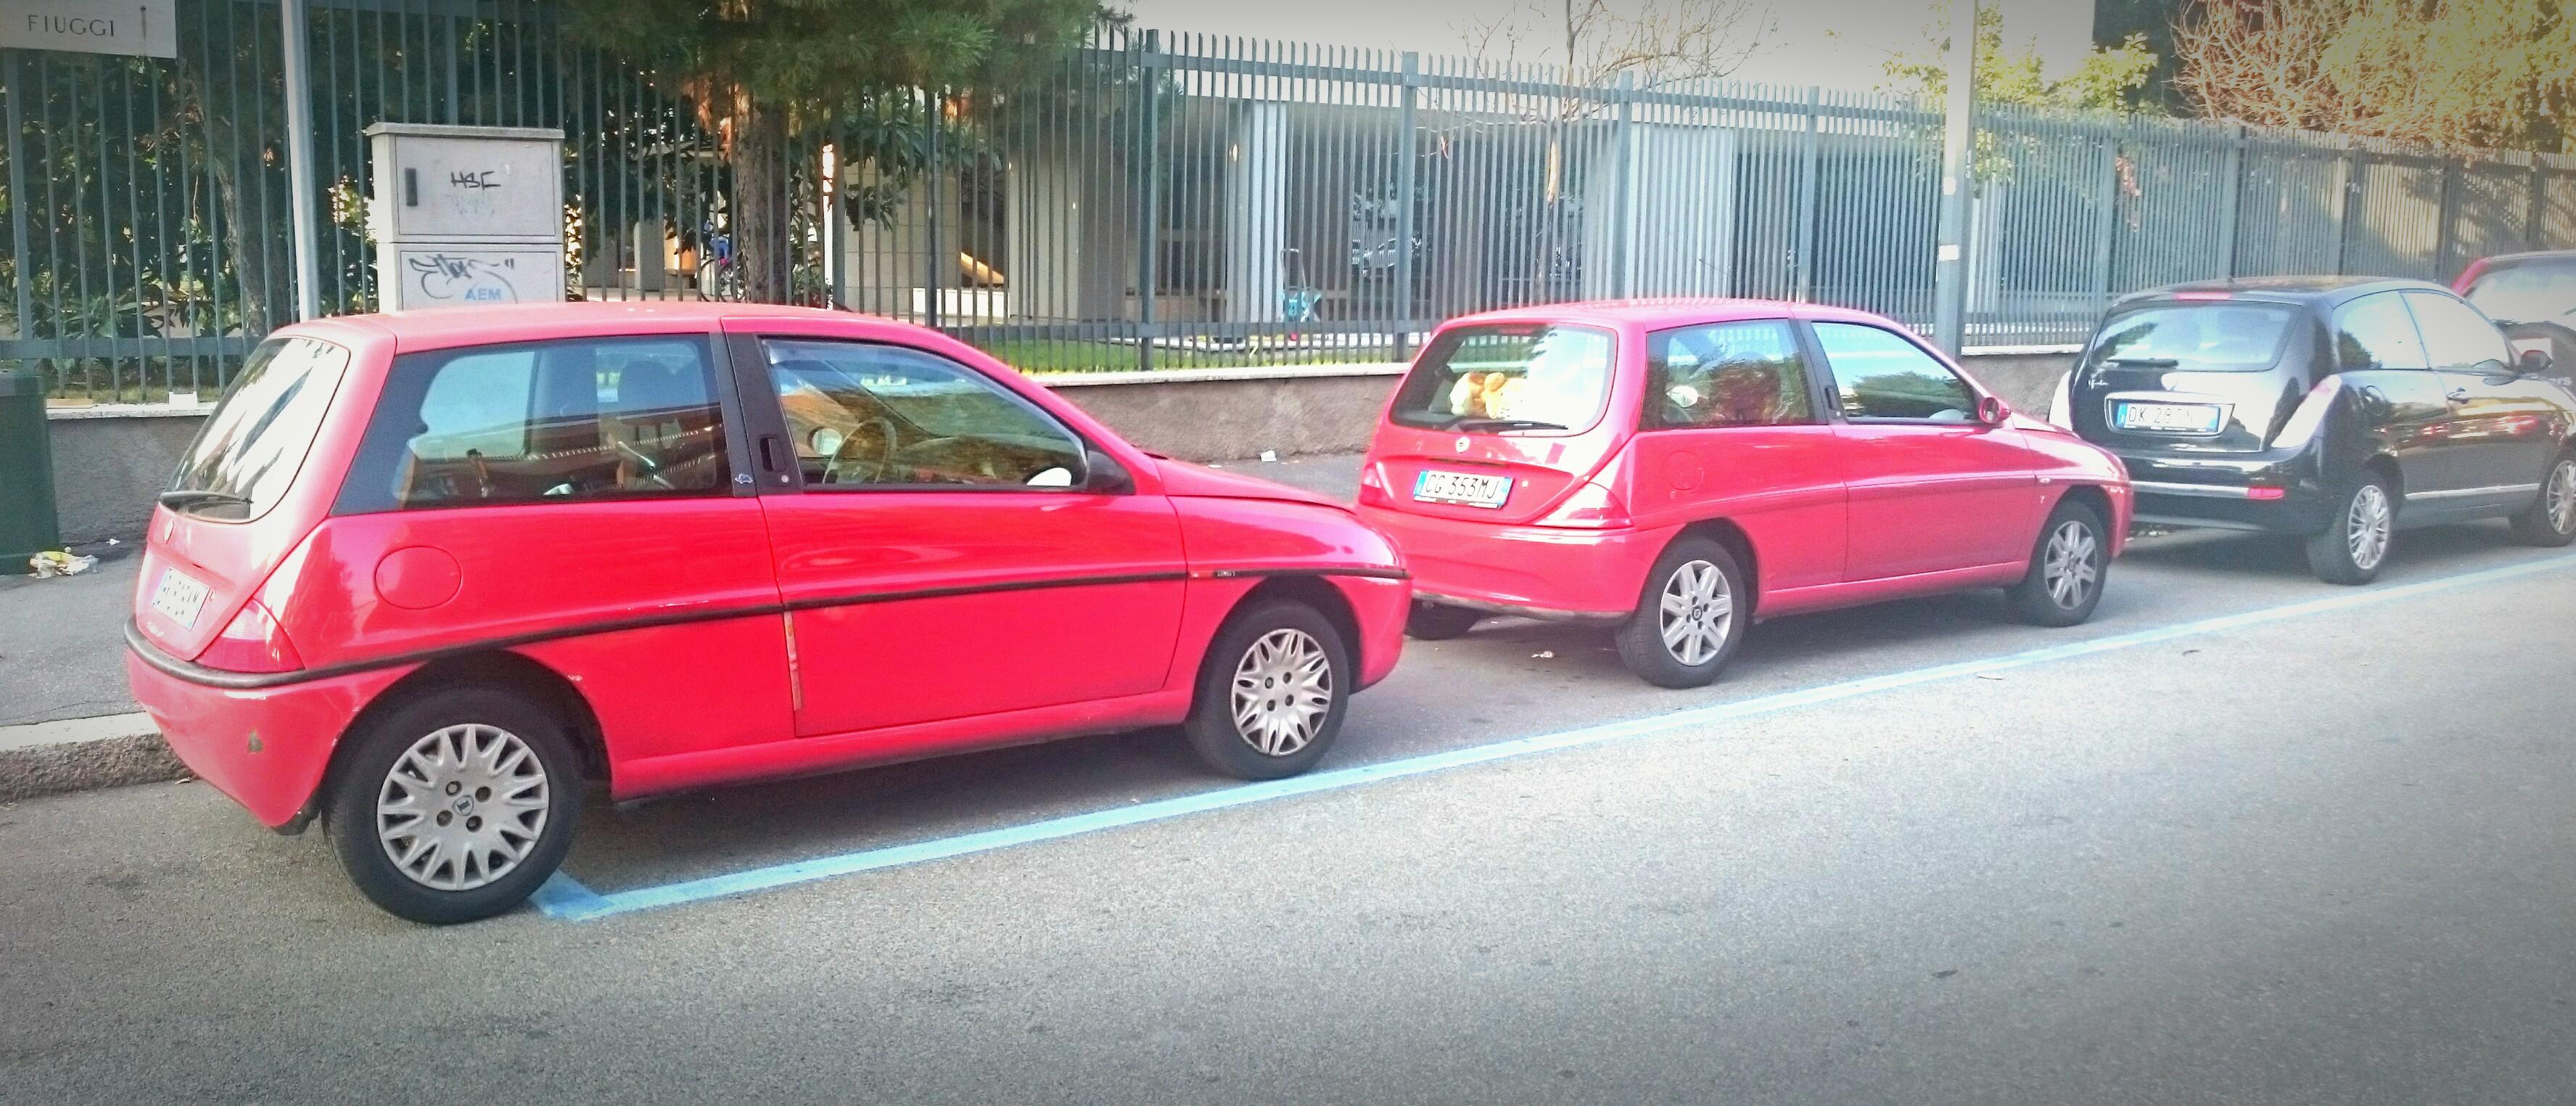 https://upload.wikimedia.org/wikipedia/commons/5/51/%2215_-_ITALY_-_Lancia_Y_%281995%29_-_Lancia_Y_restyling_%282000%29_-_Lancia_Ypsilon_%282003%29_parked_01.JPG